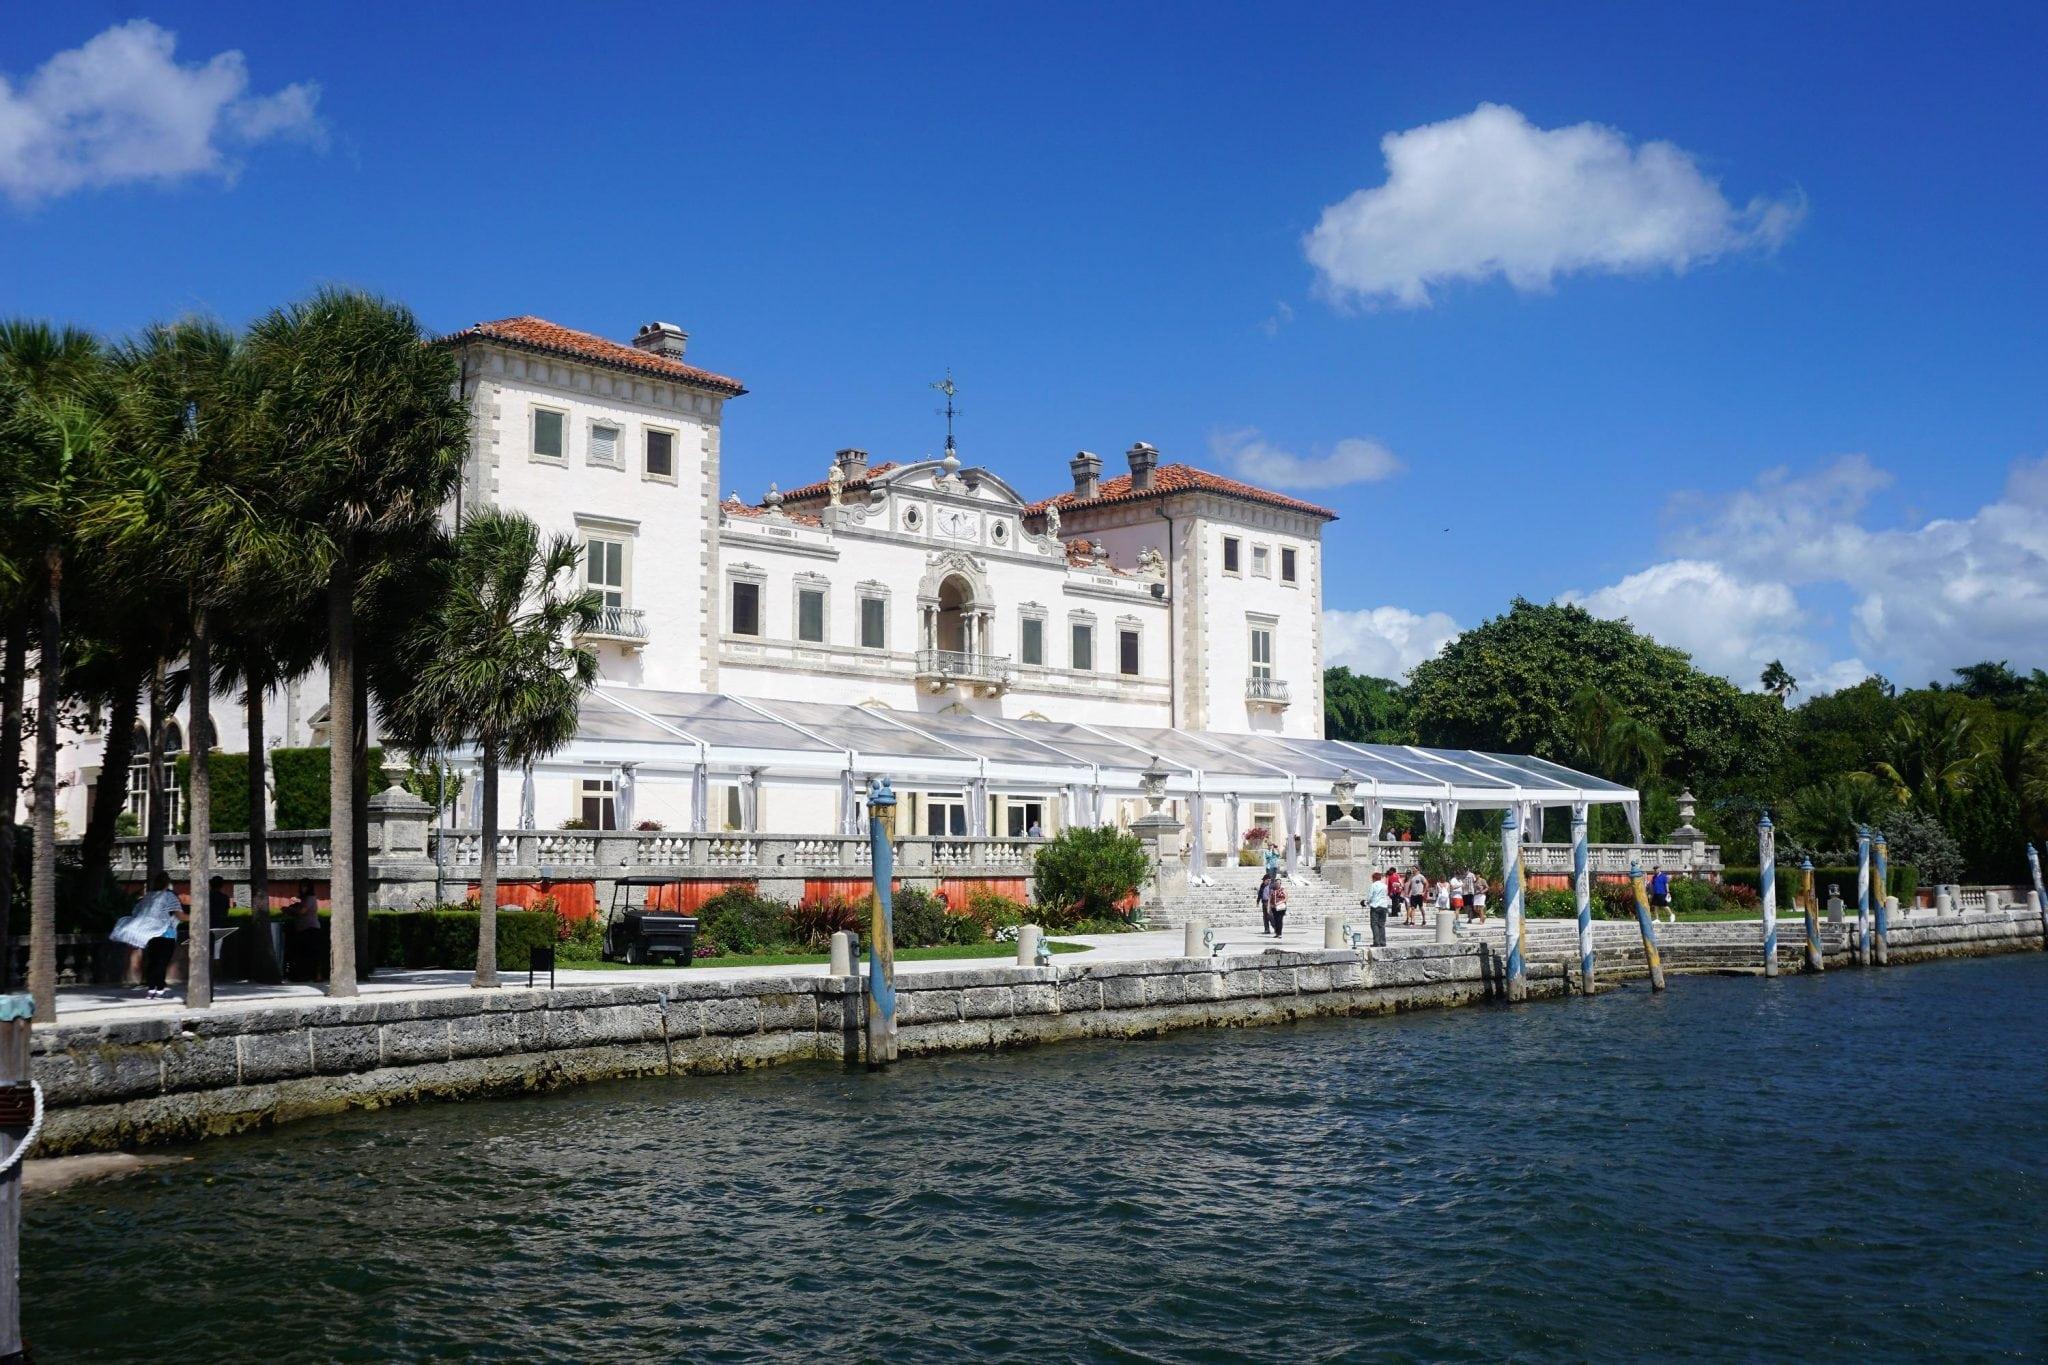 Exteroir of Vizcaya Main House